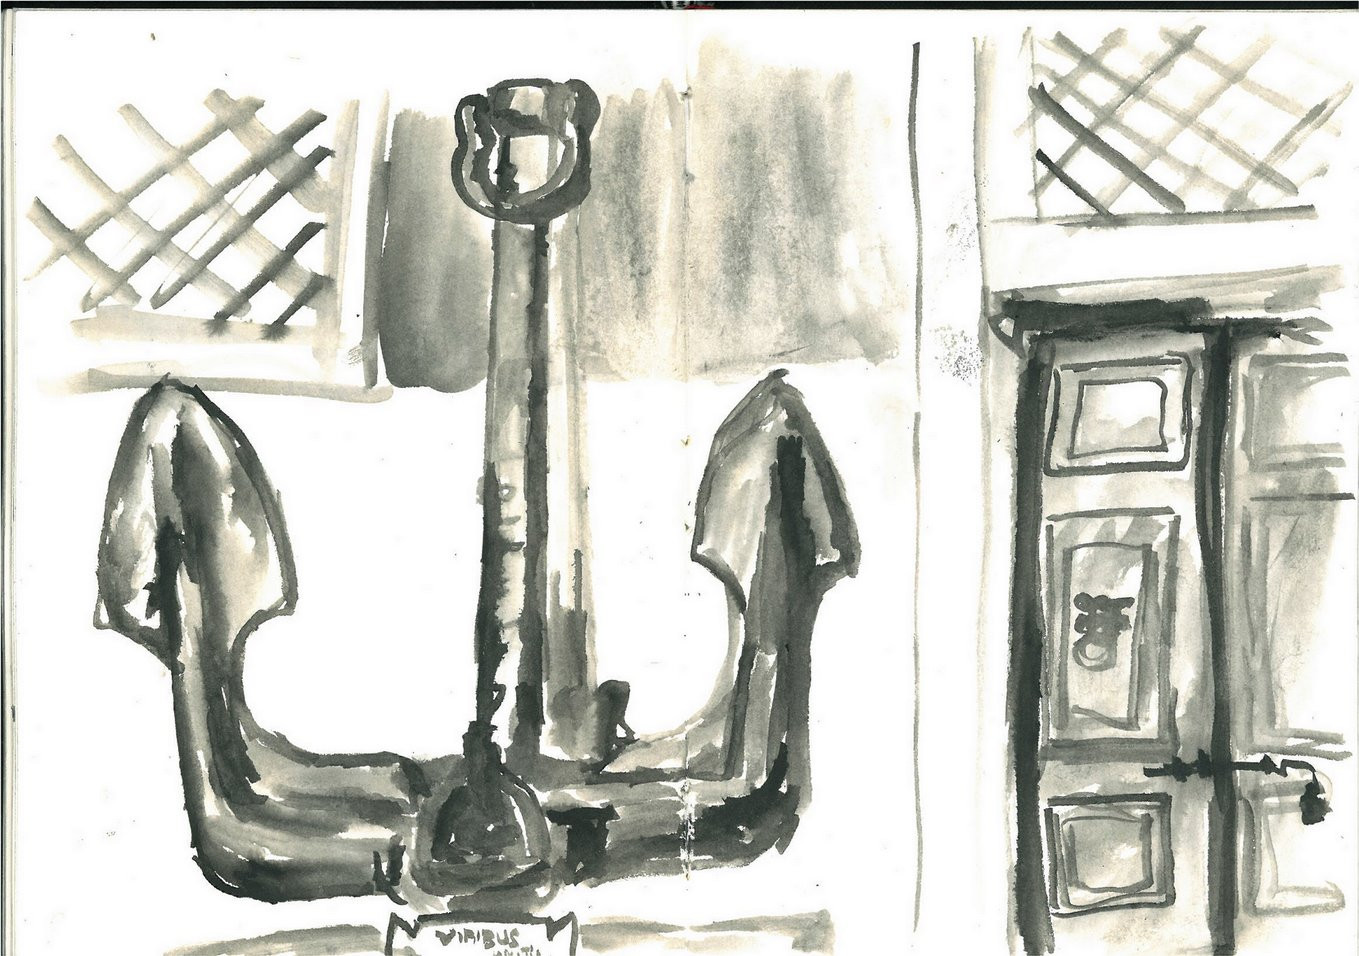 venise 6.jpg